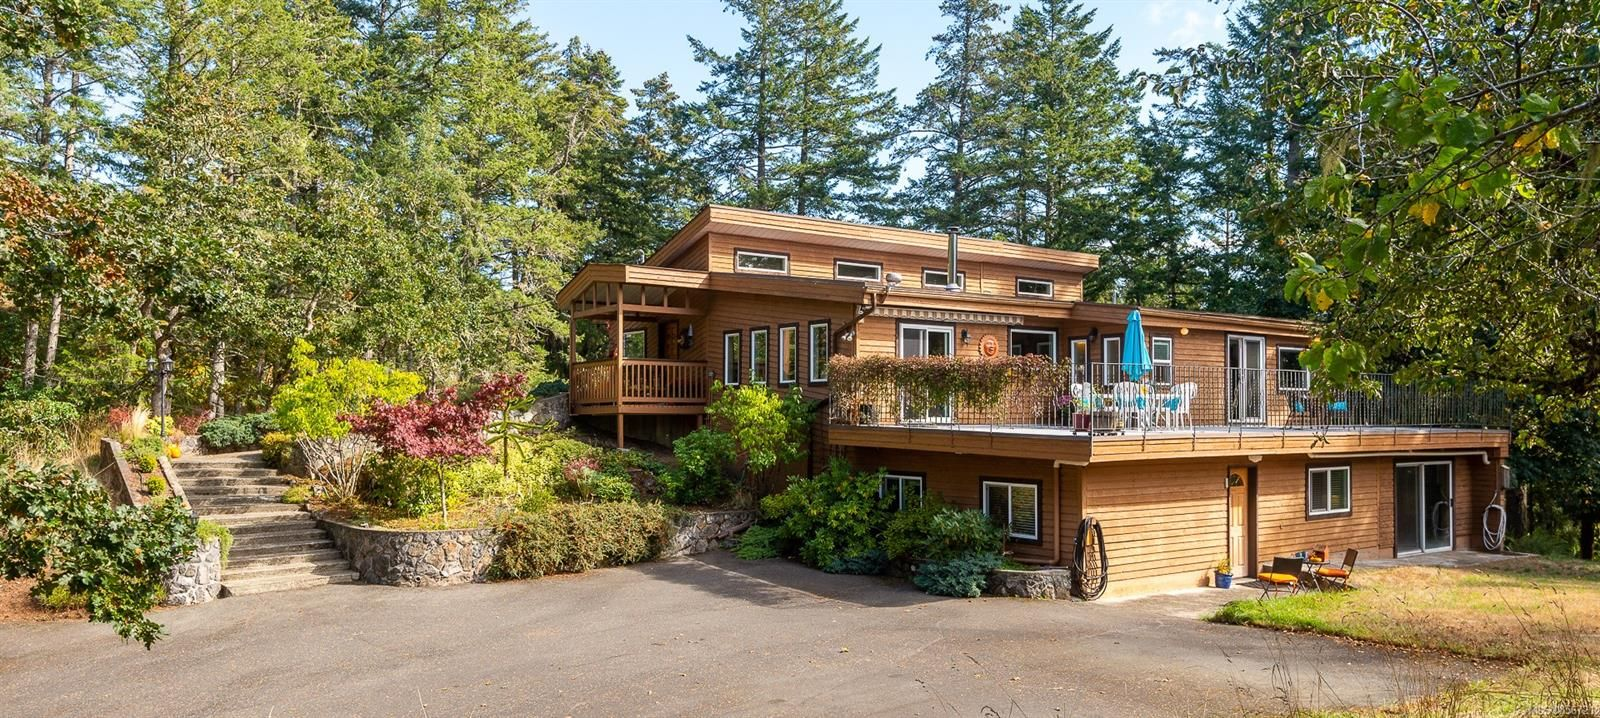 Main Photo: 4263 Happy Valley Rd in : Me Metchosin House for sale (Metchosin)  : MLS®# 856721